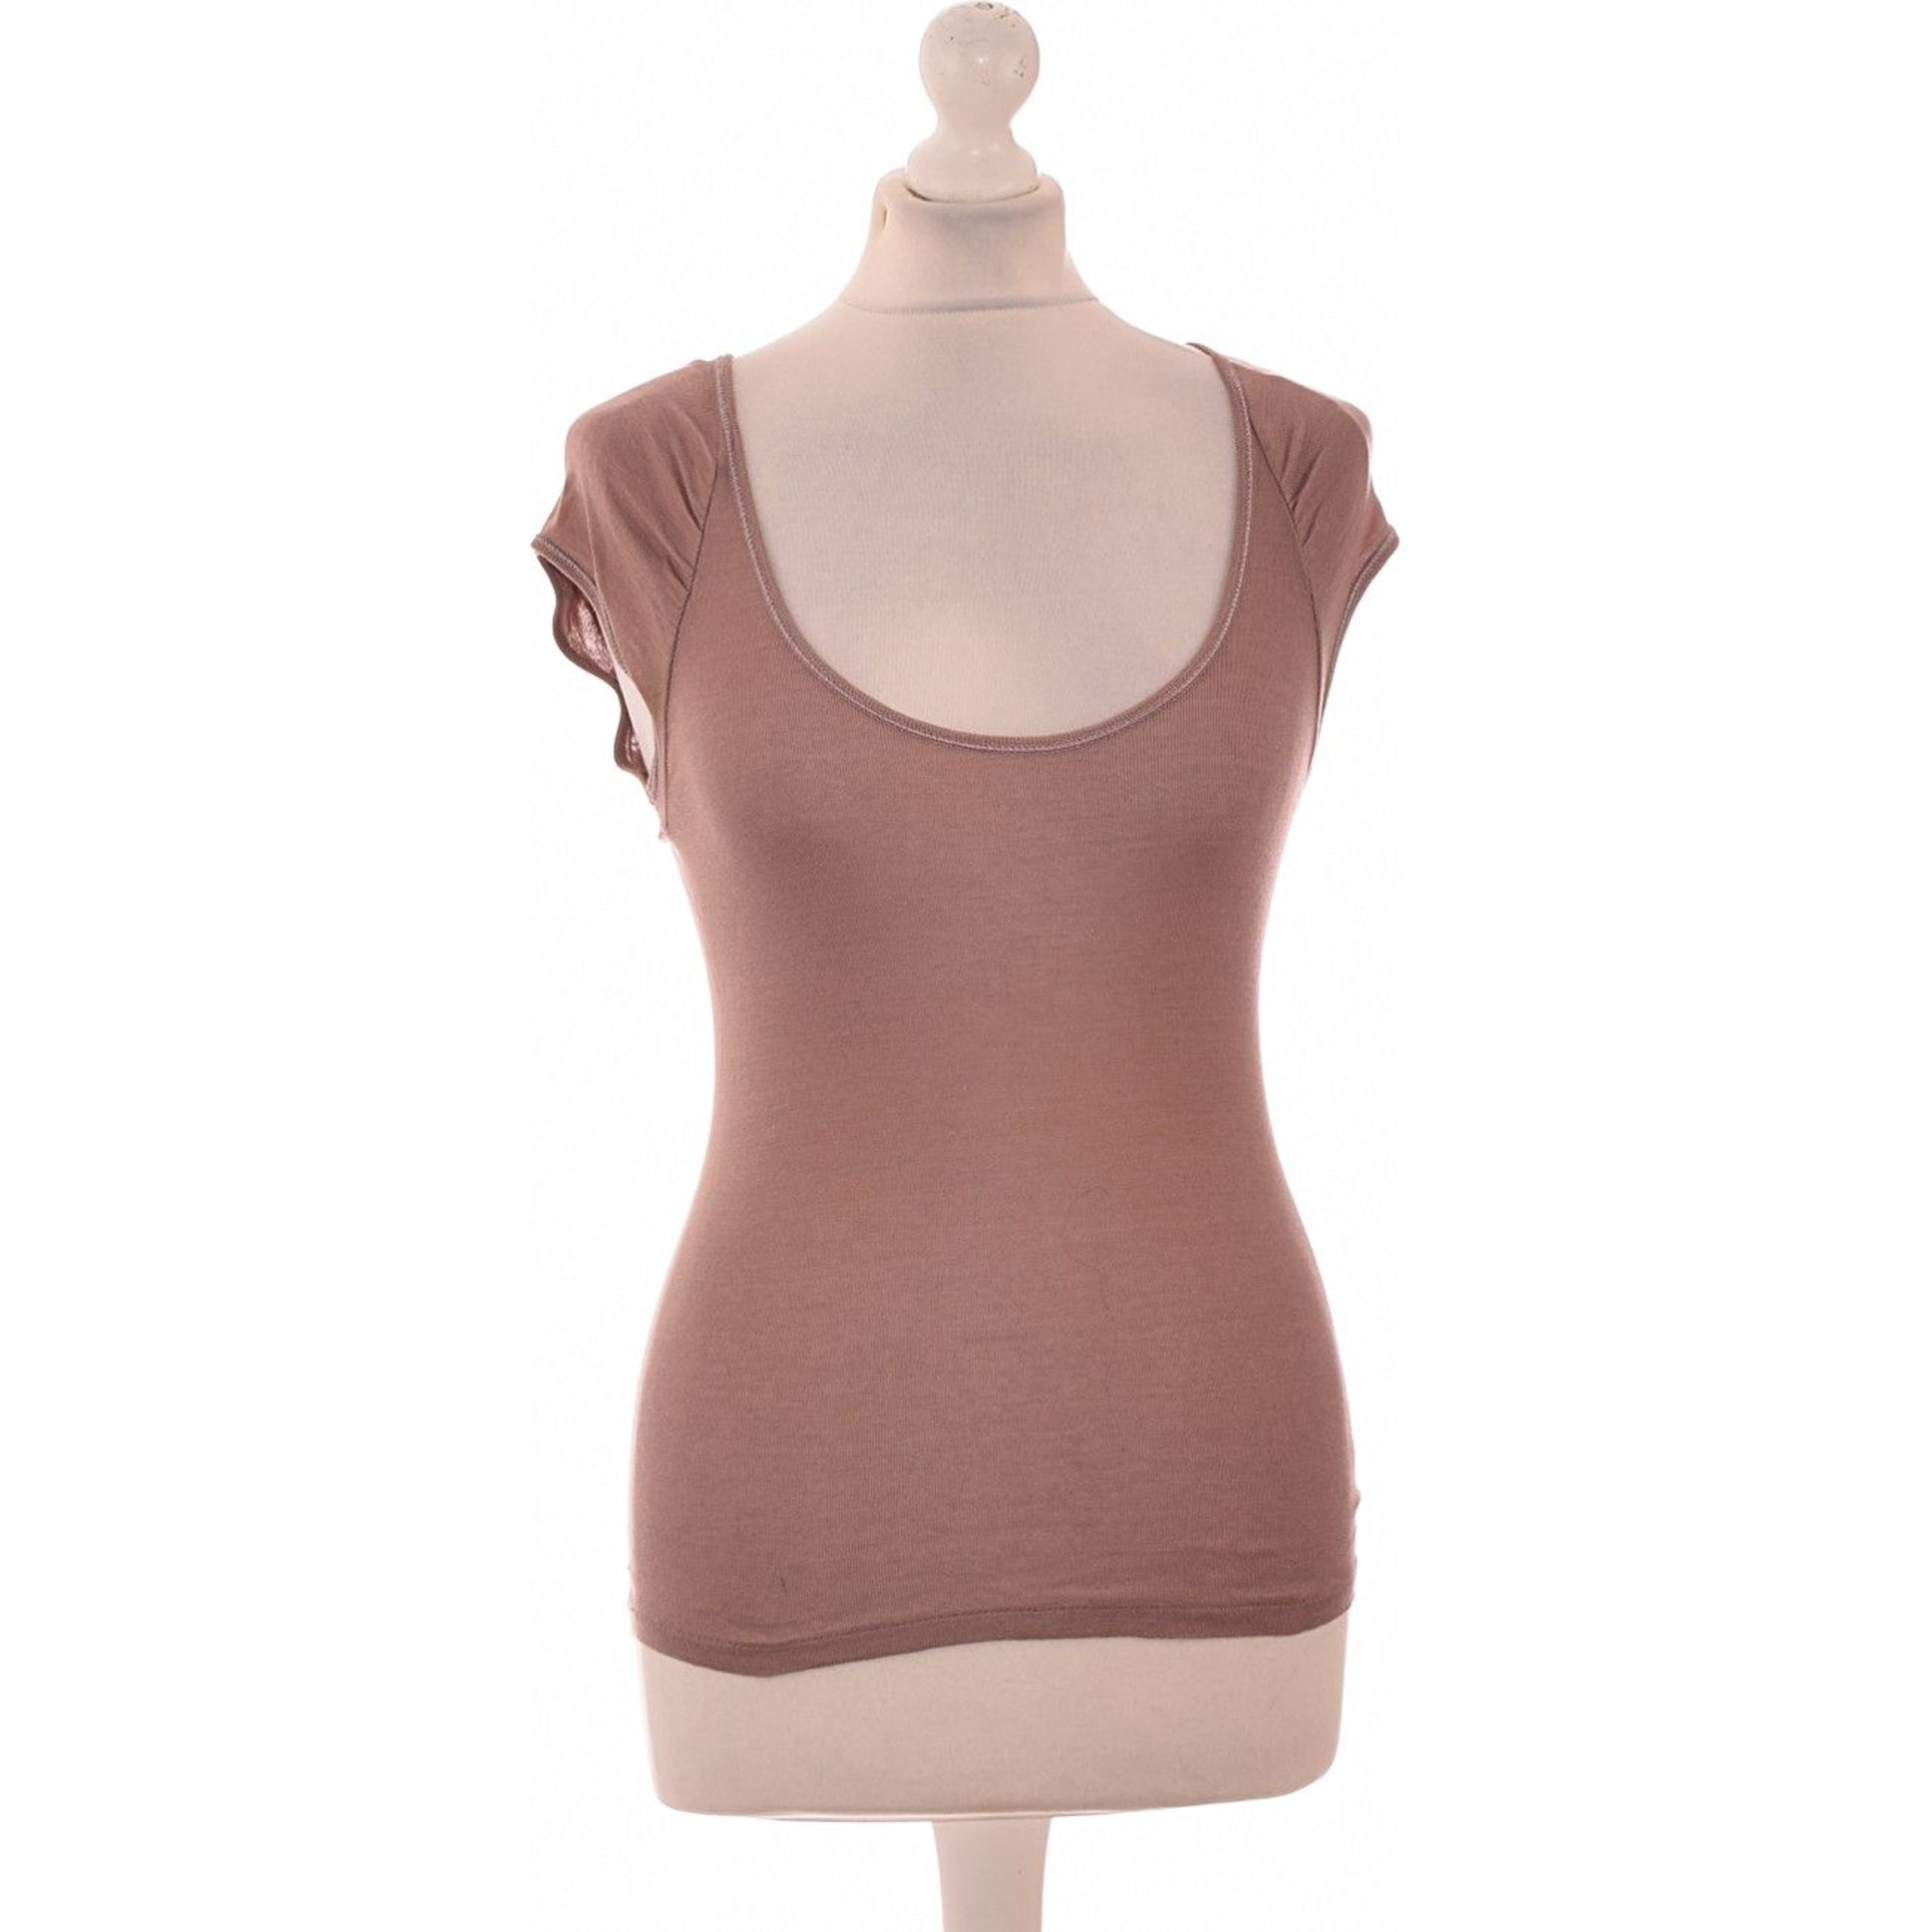 Top, T-shirt VANESSA BRUNO Pink, fuchsia, light pink